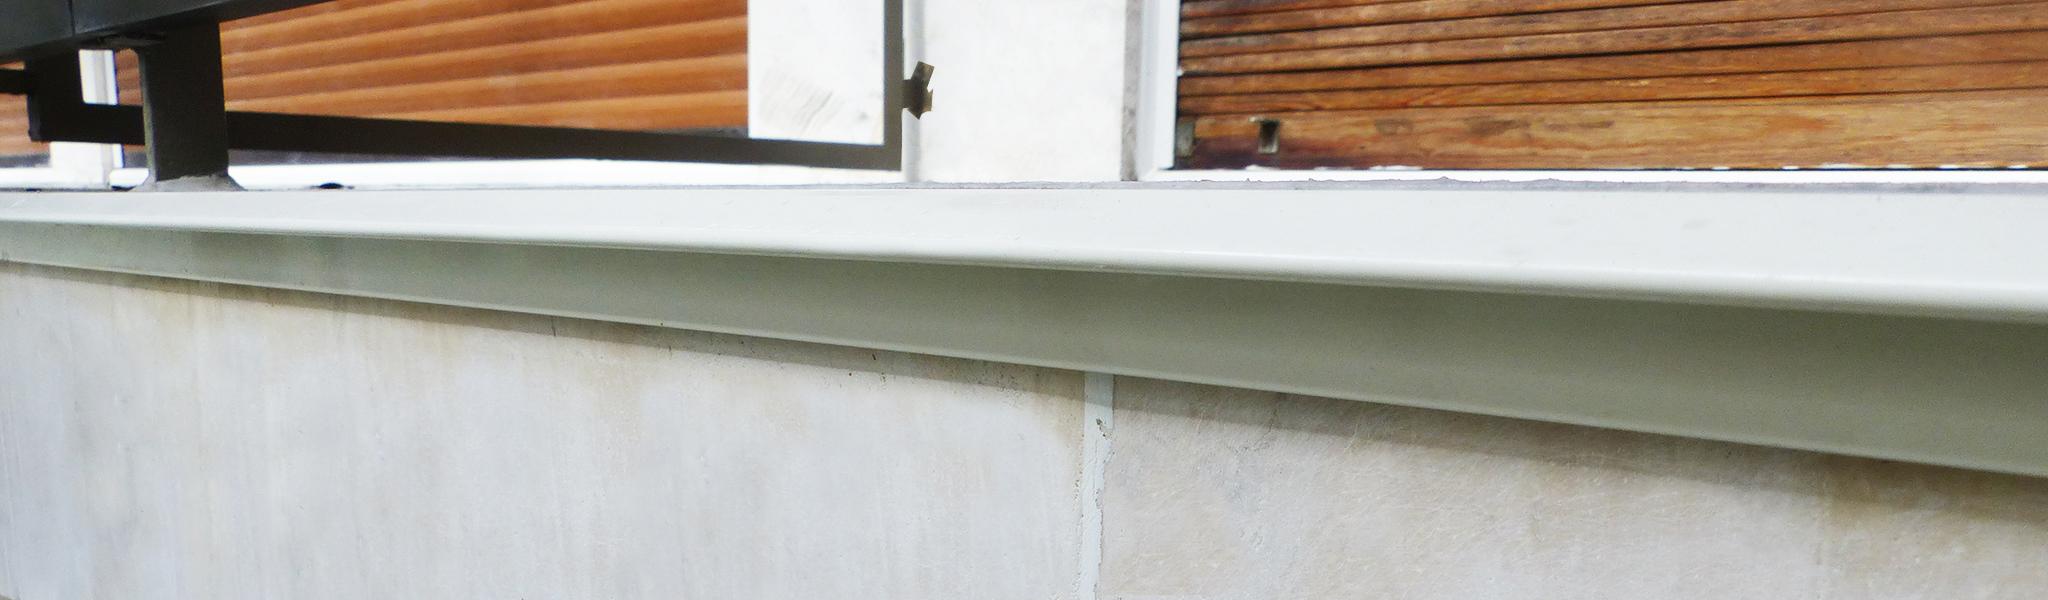 dani alu dallnet series c tiling. Black Bedroom Furniture Sets. Home Design Ideas